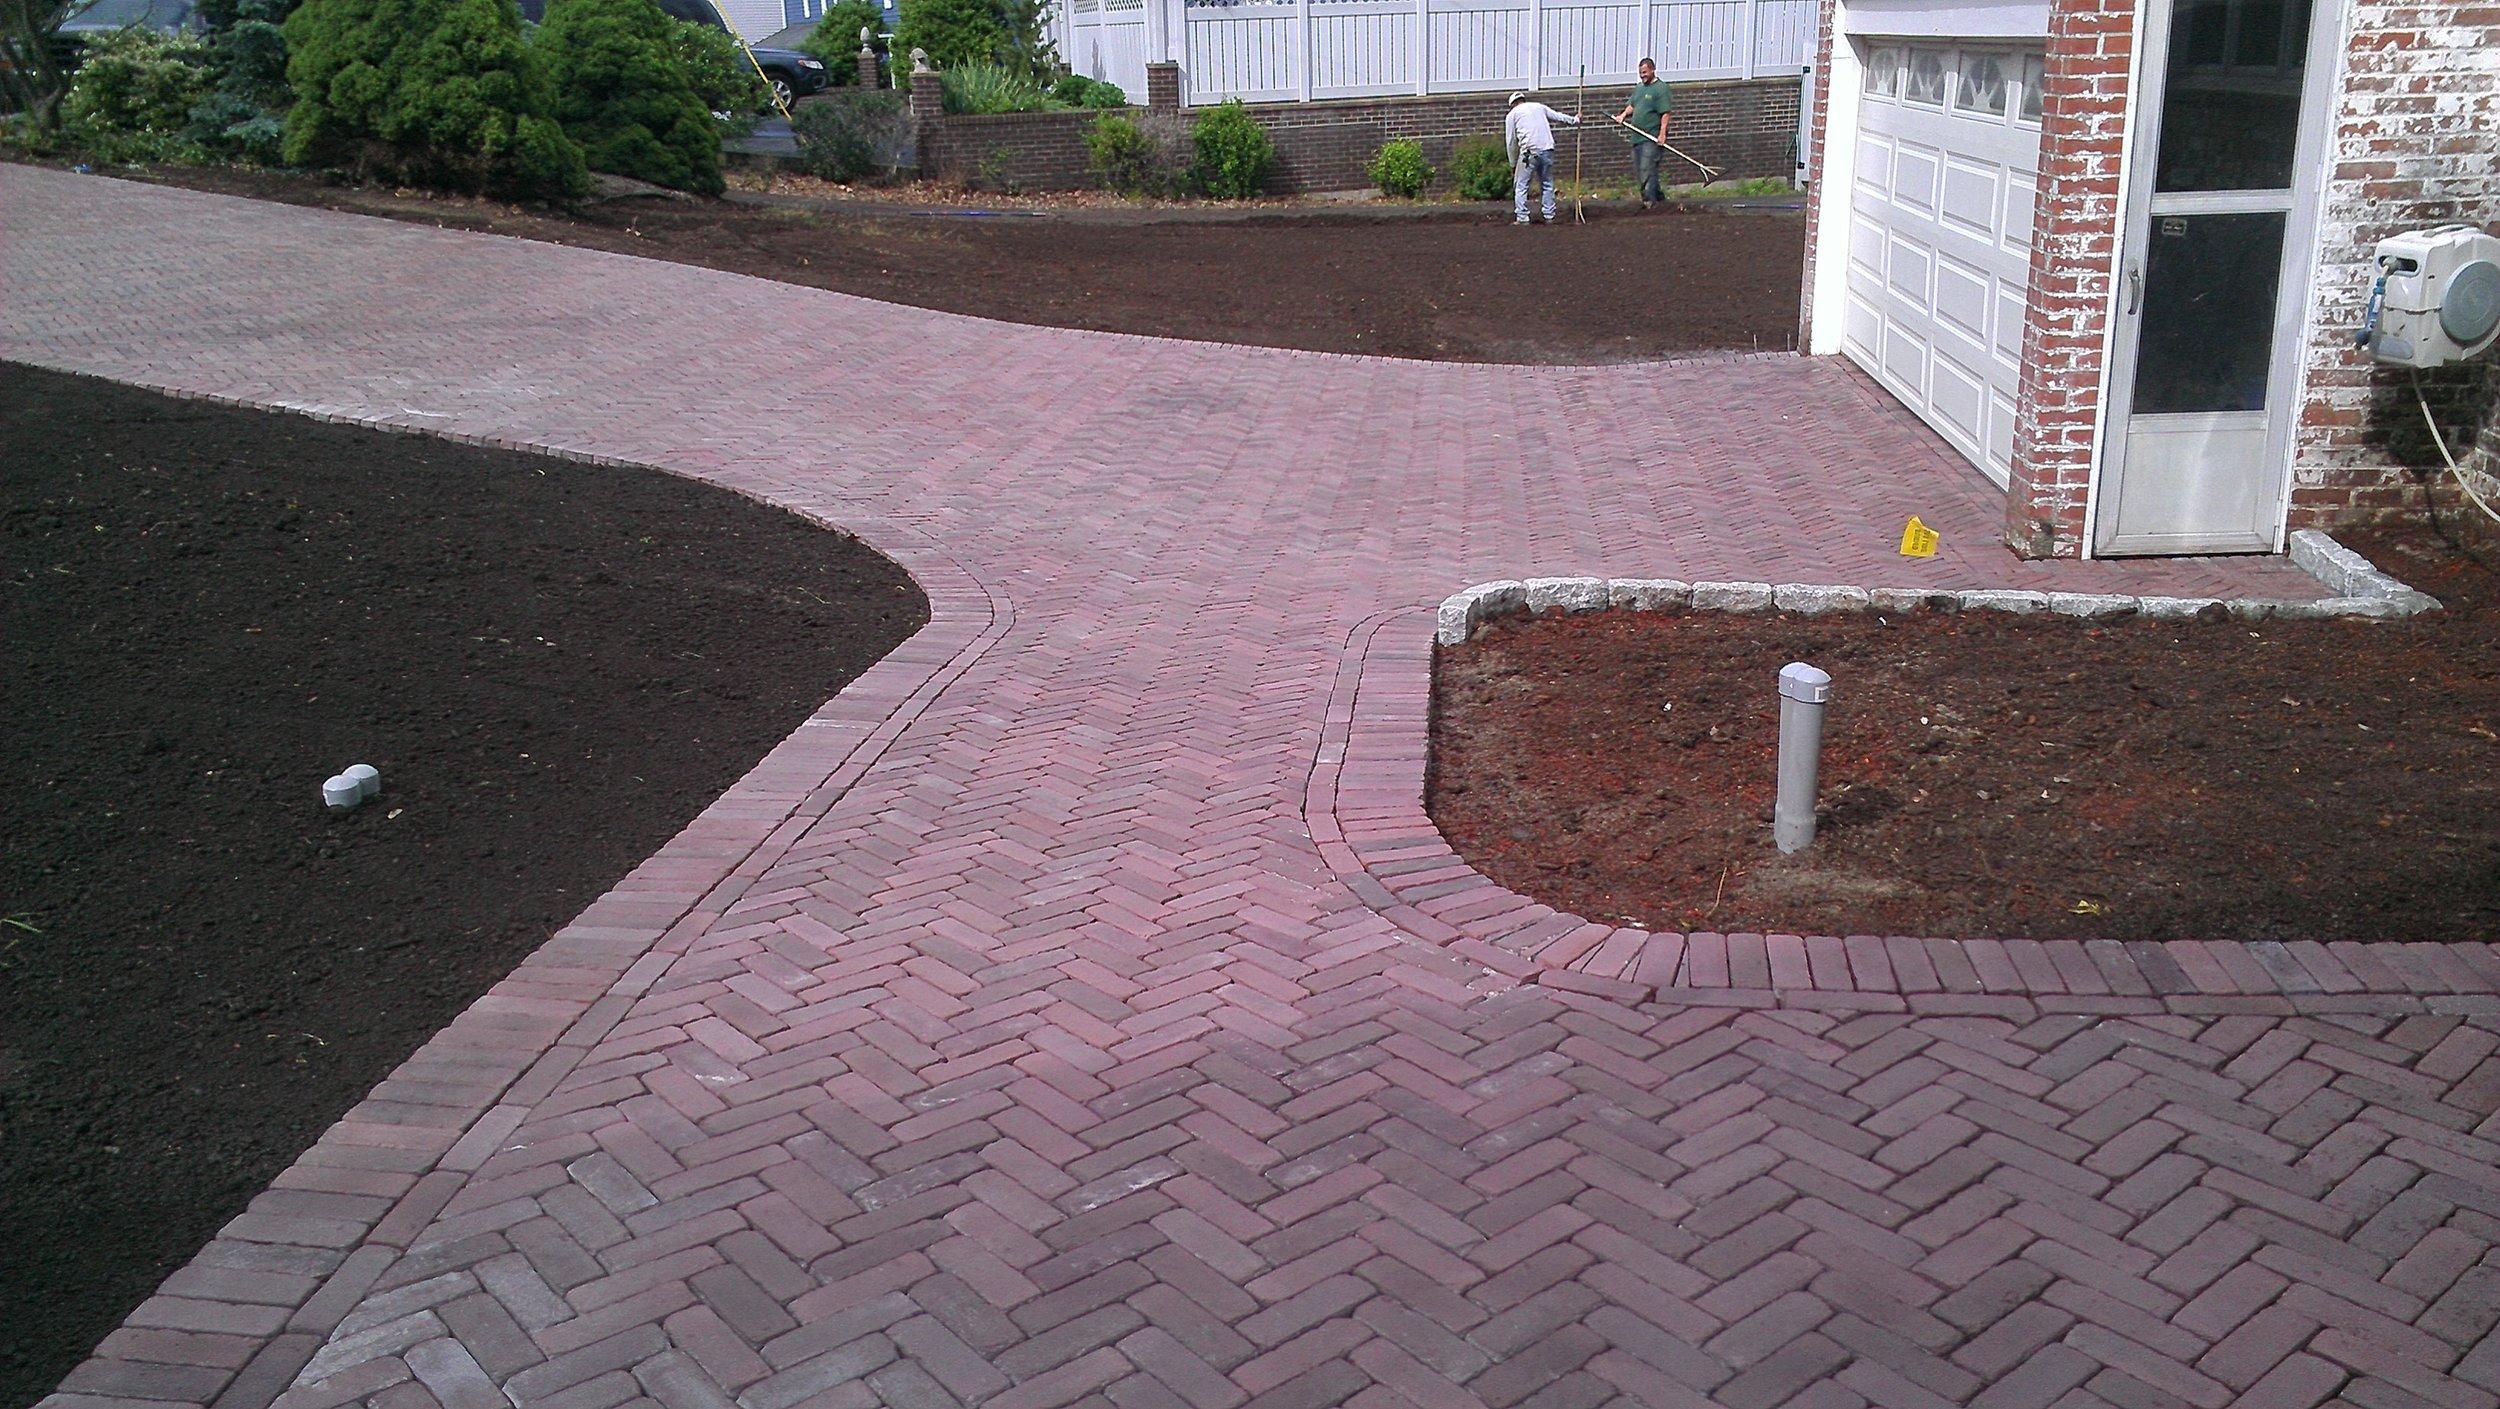 Brick Paver Sidewalk Completed